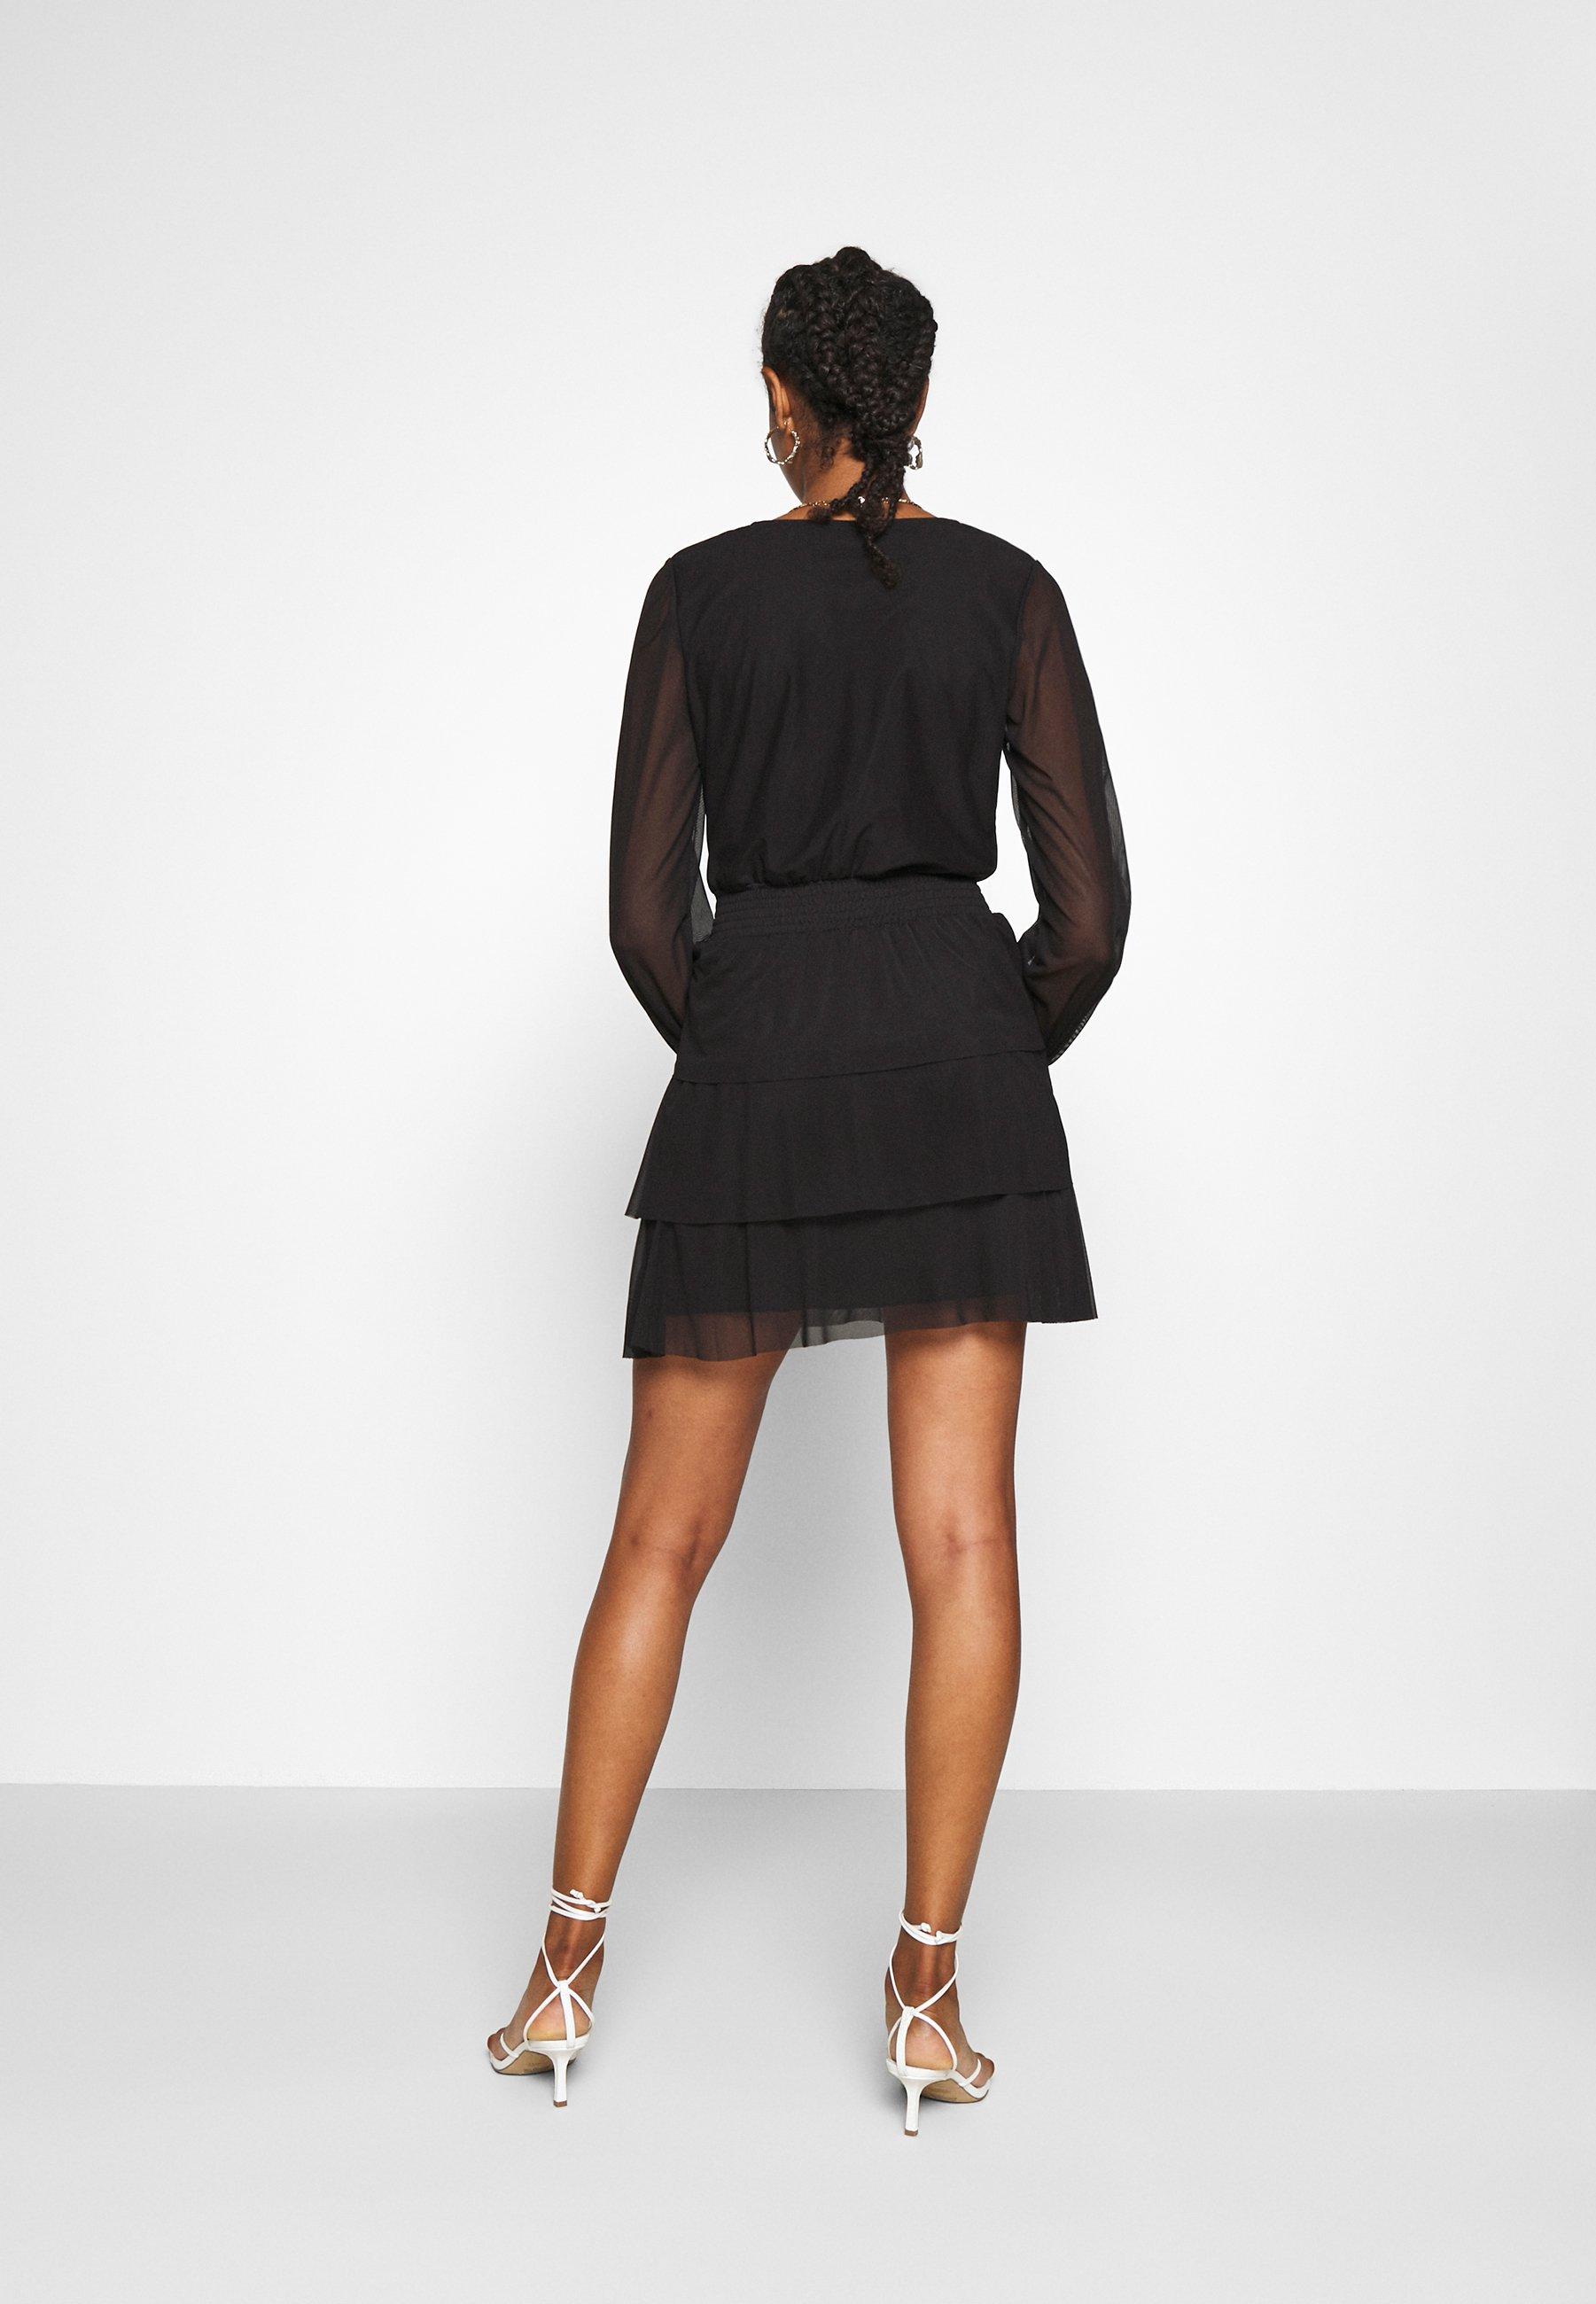 Gina Tricot ALICE DRESS - Robe d'été - black - Robes femme LNeEd